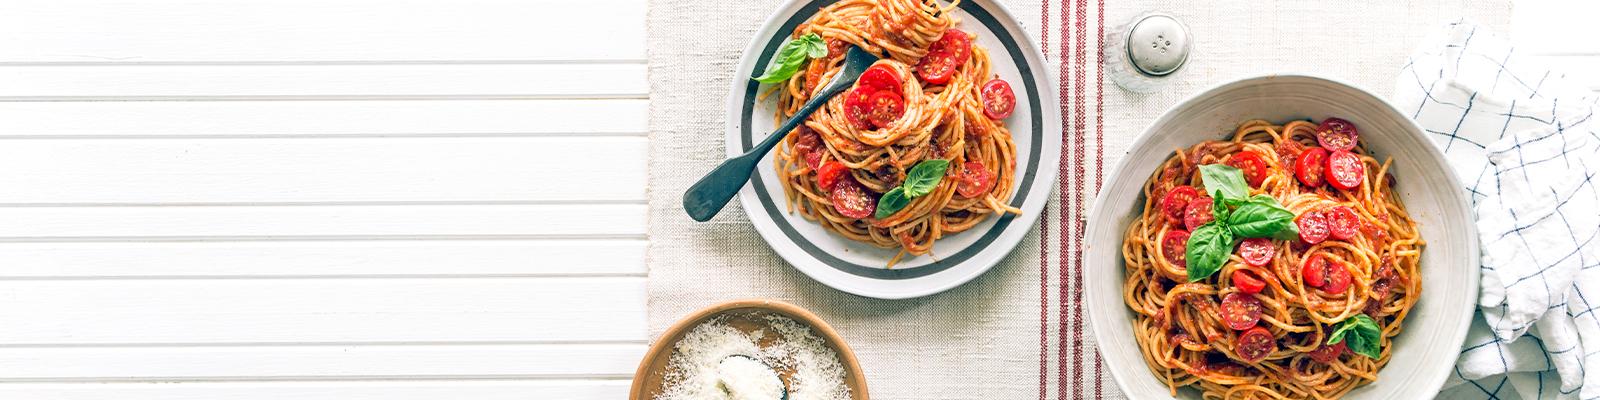 Pasta Garofalo - Tomaten